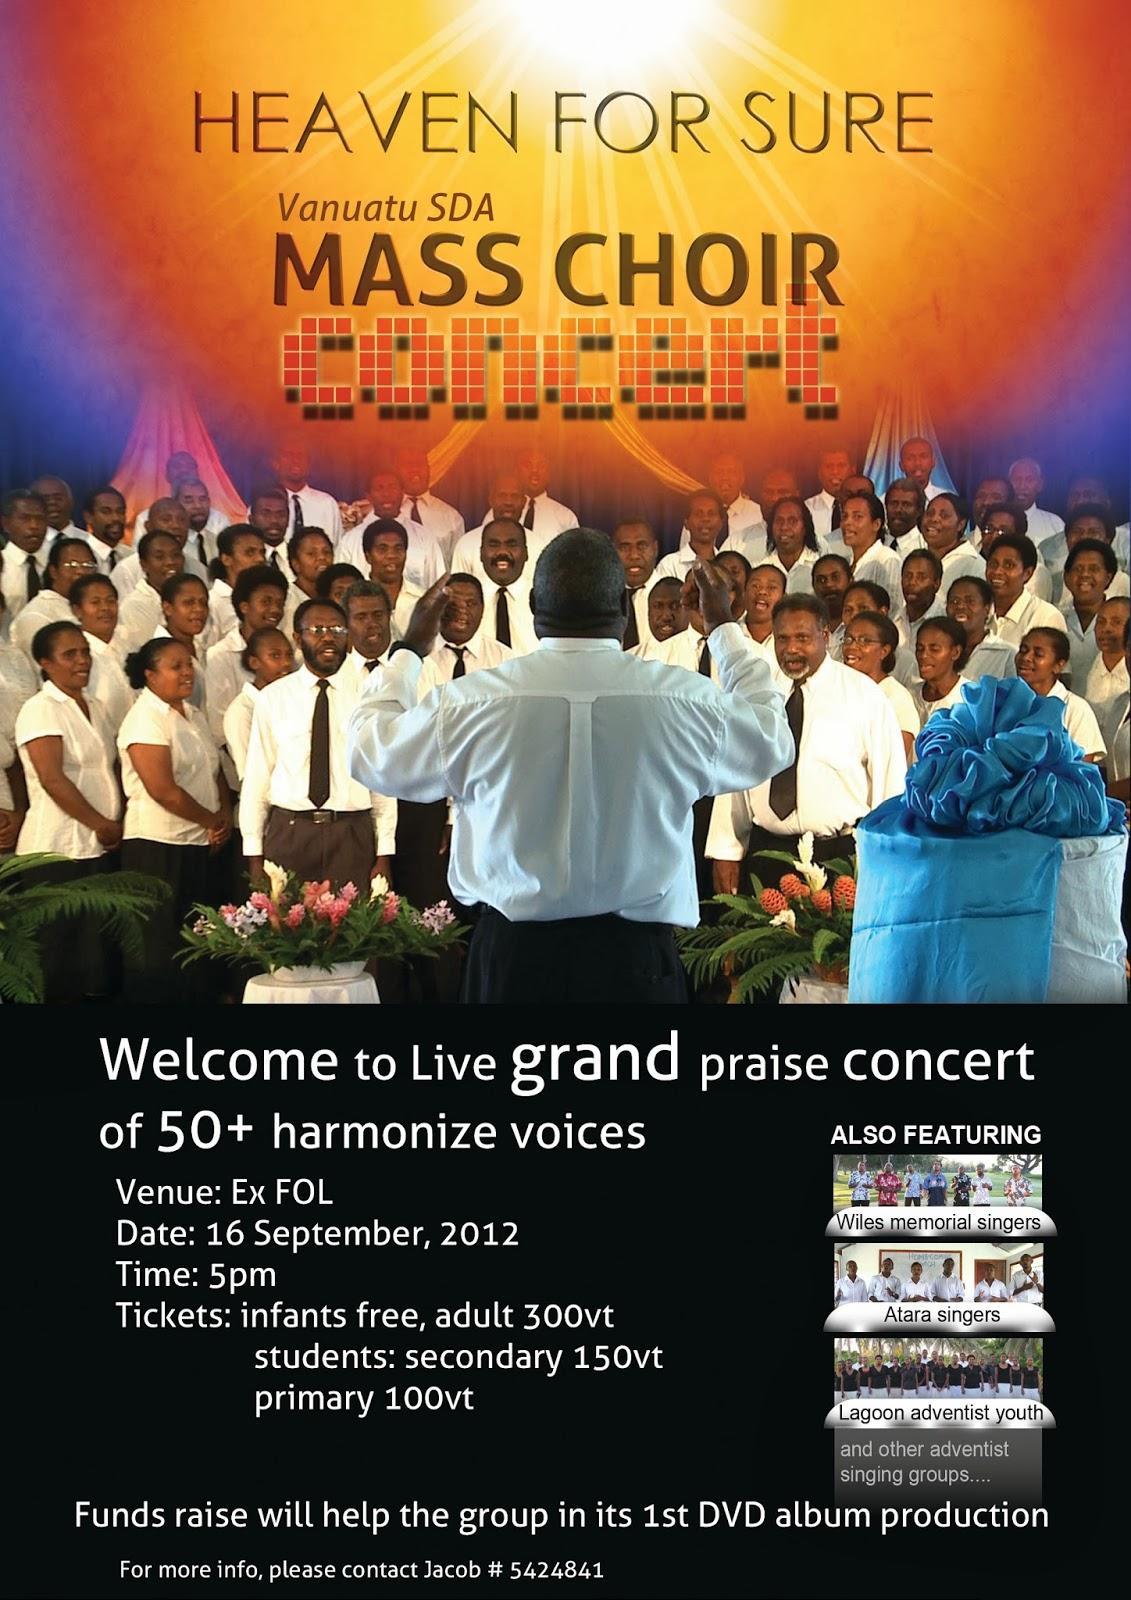 Design poster for concert - Poster Vanuatu Advent Herald Concert